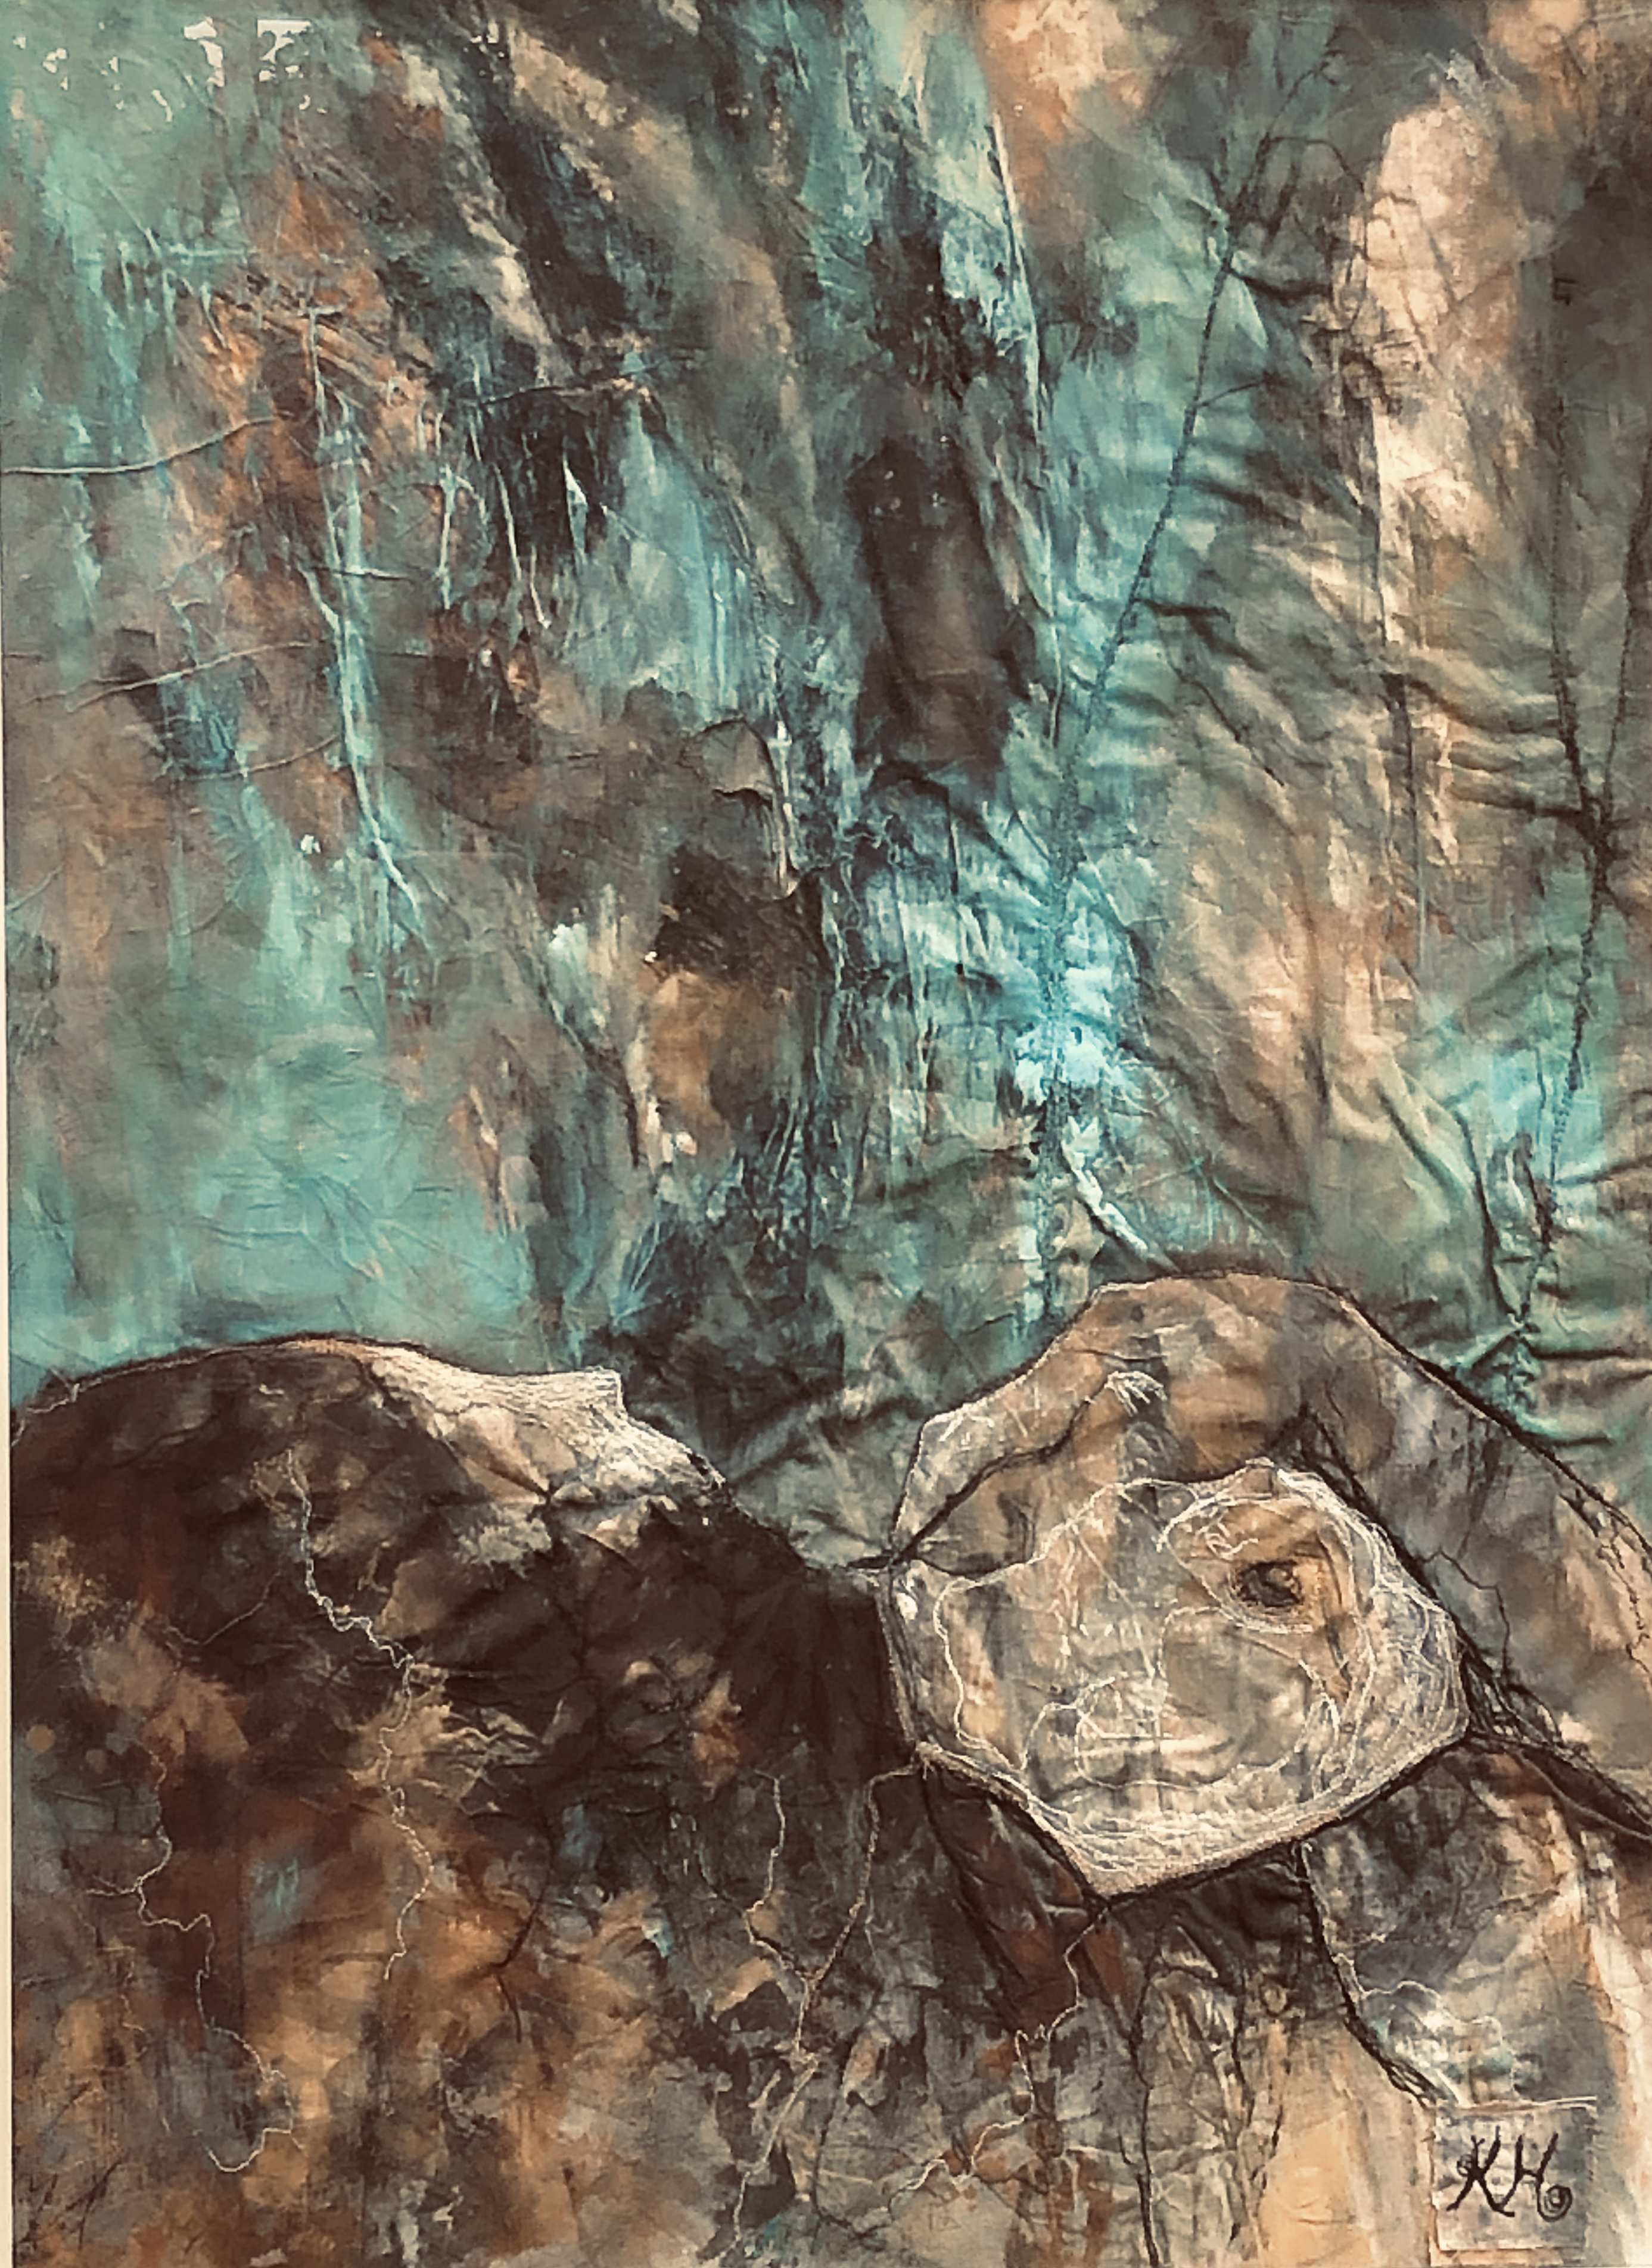 'Cerulean Cave'